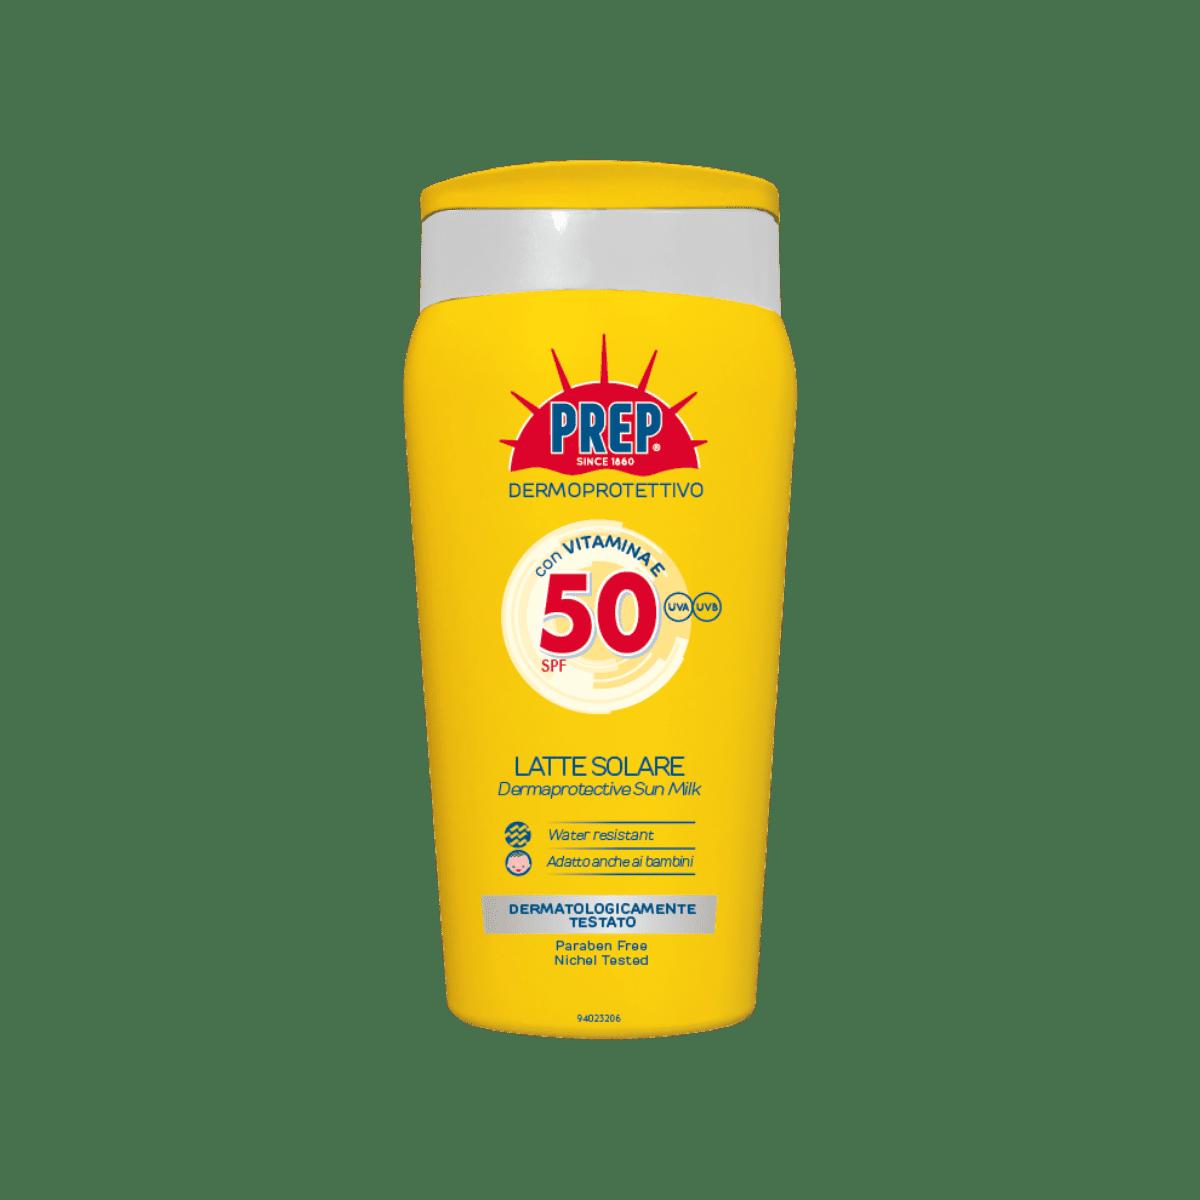 PREP Derma Protective Sun Milk SPF 50 - ochranné opalovací mléko, 200 ml